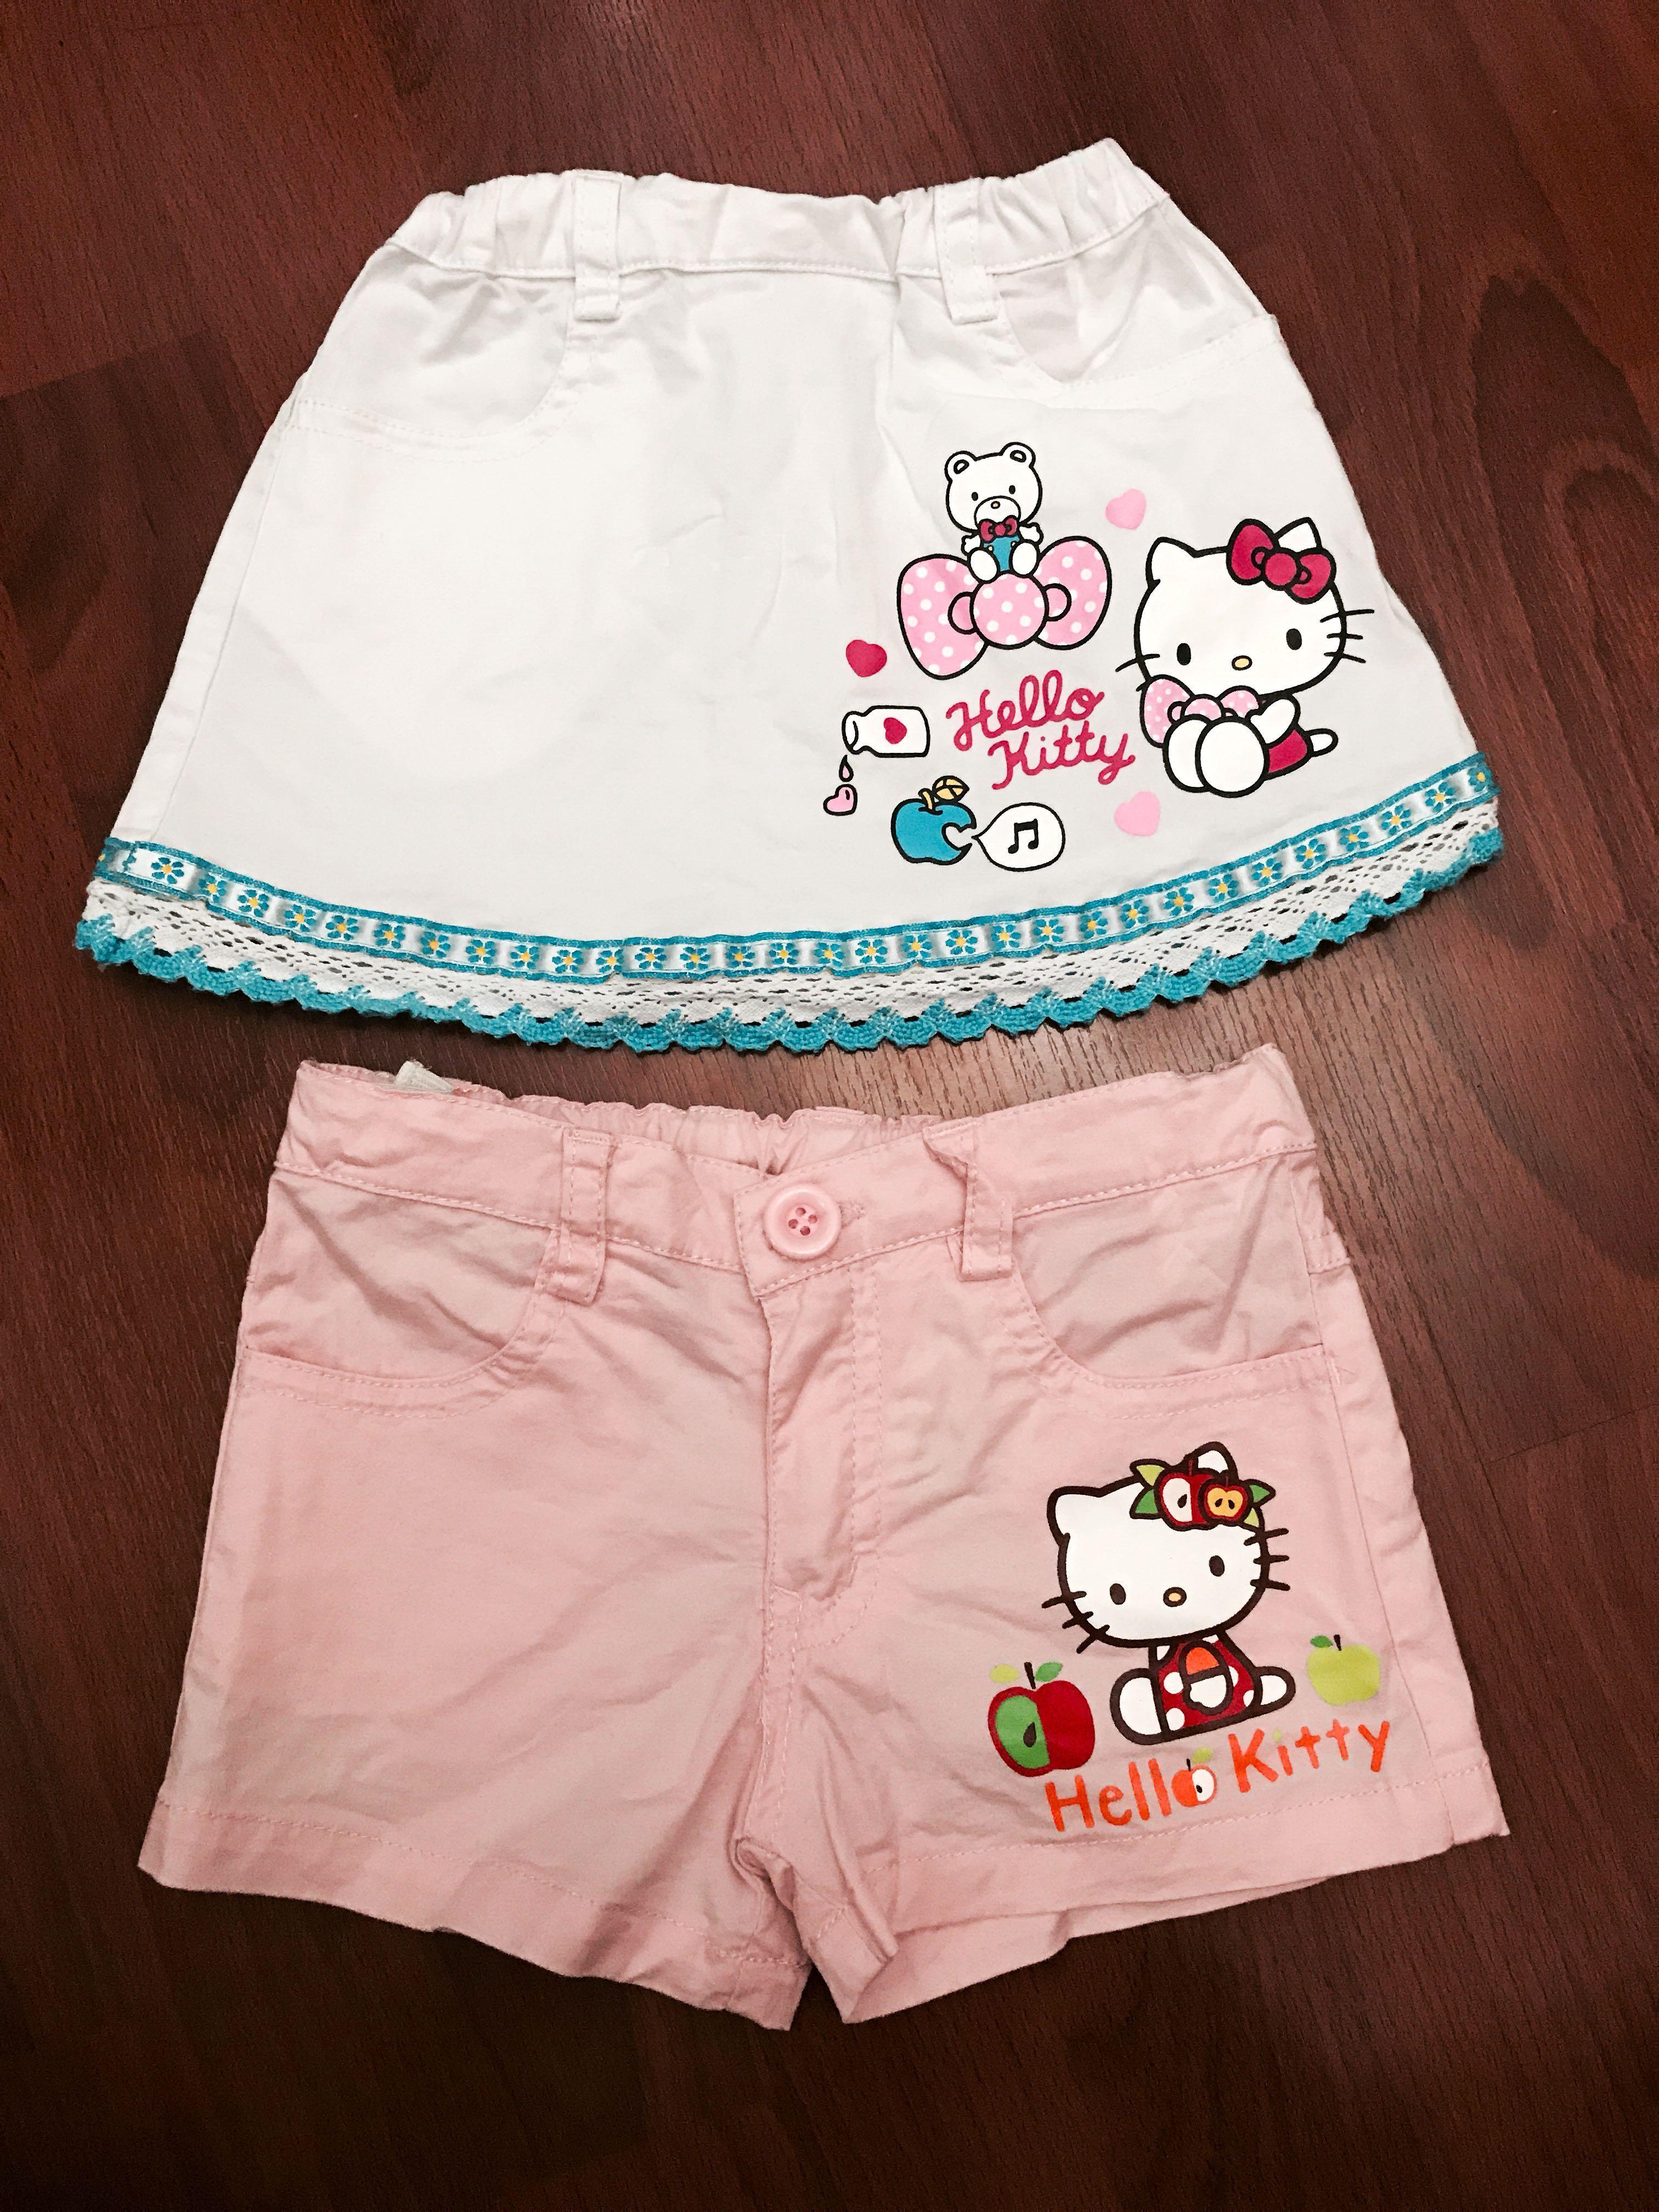 acd212da7 Sanrio Hello Kitty Shorts/Skirt, Babies & Kids, Babies Apparel on Carousell